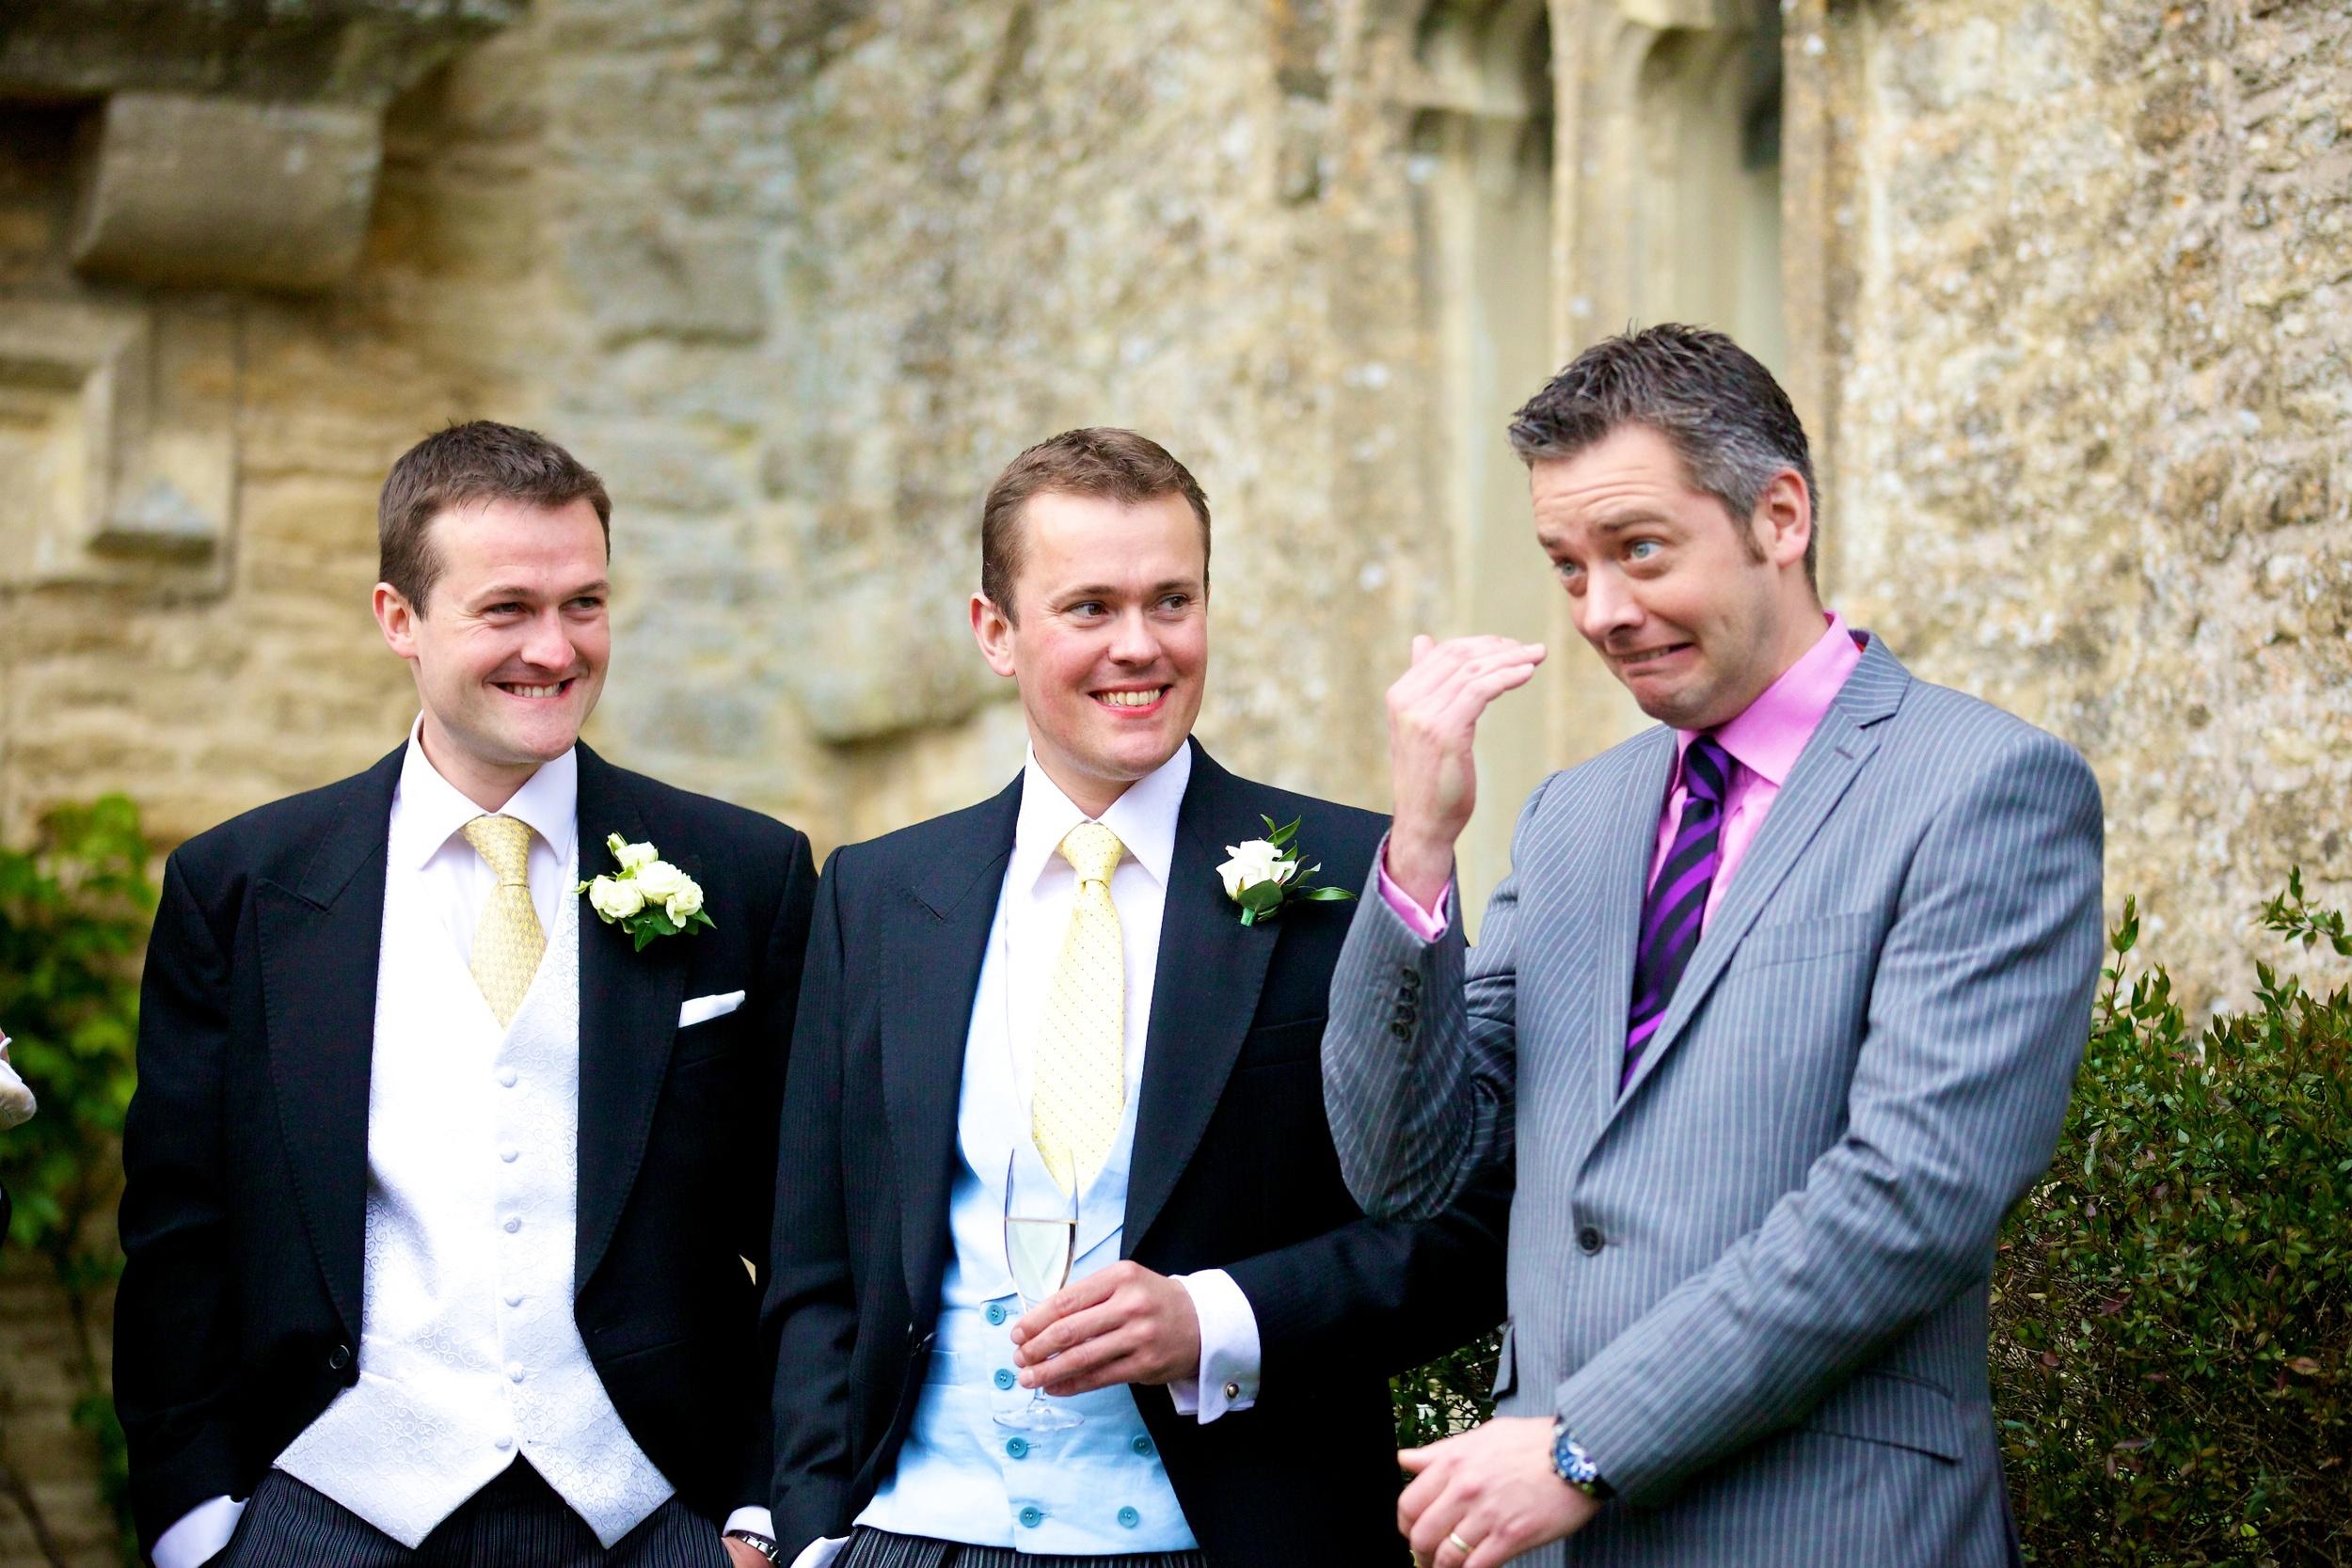 chavenage house wedding  0480.jpg